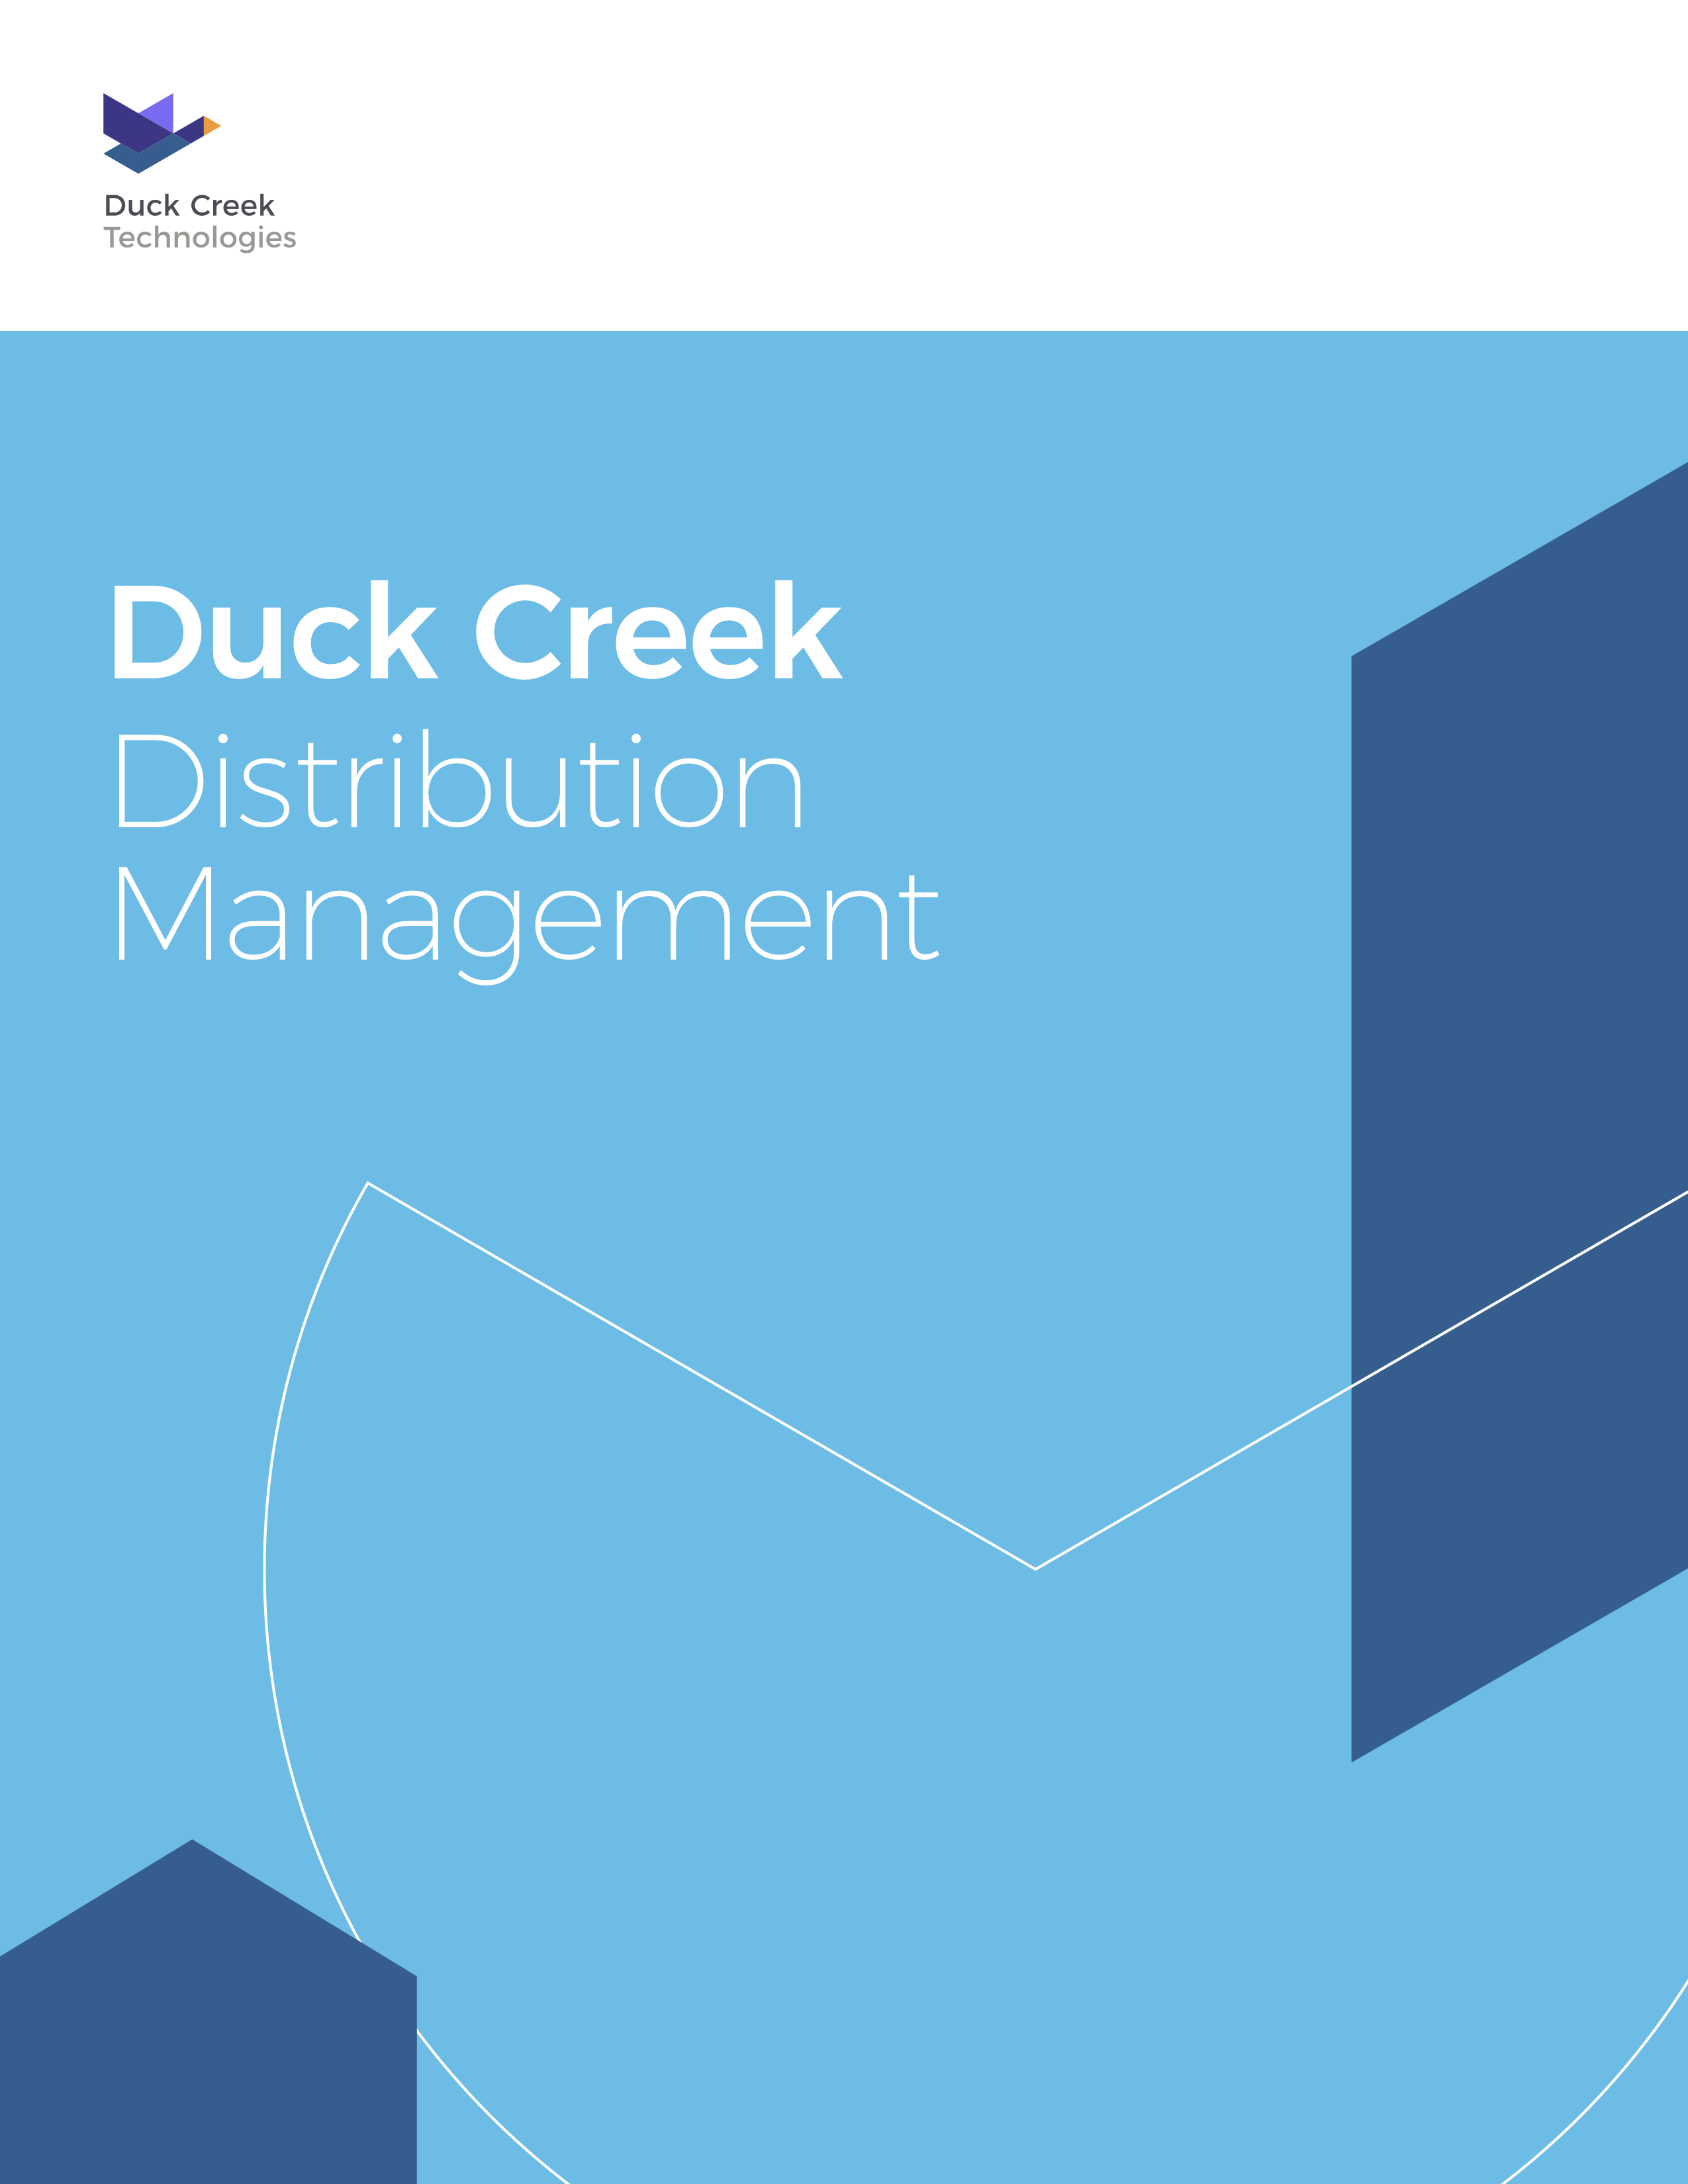 Duck Creek Distribution Management Brochure Thumbnail Image.png